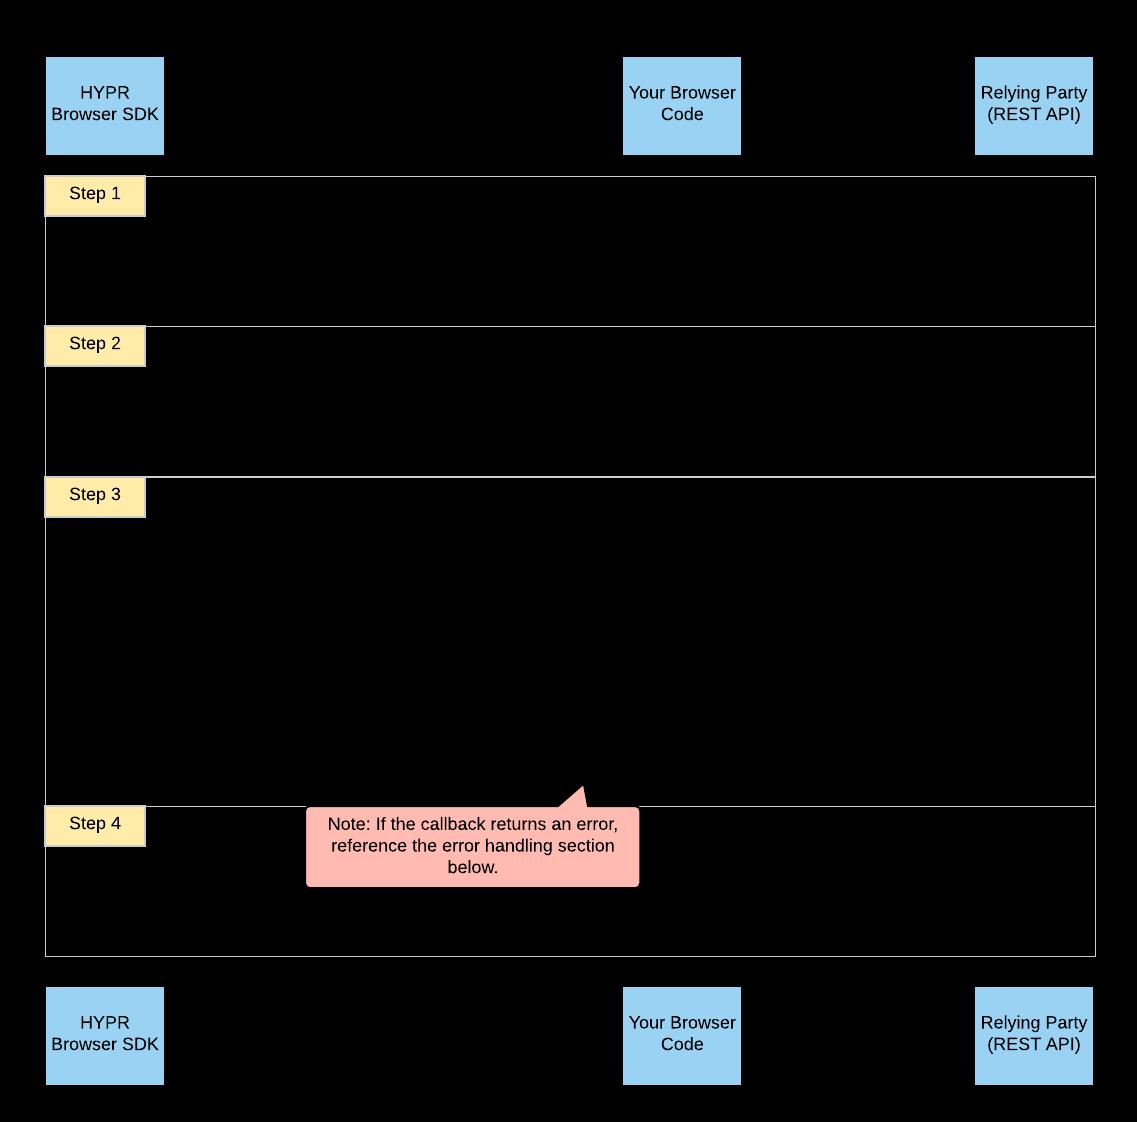 Registration Flow Diagram